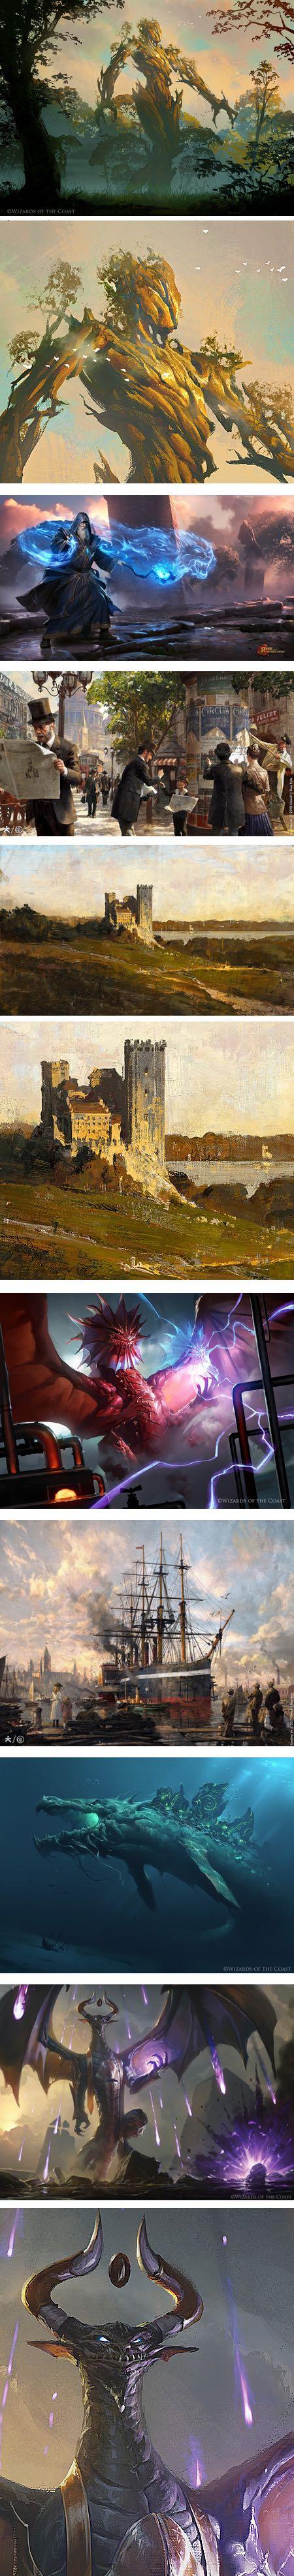 Fantasy Art Illustrators